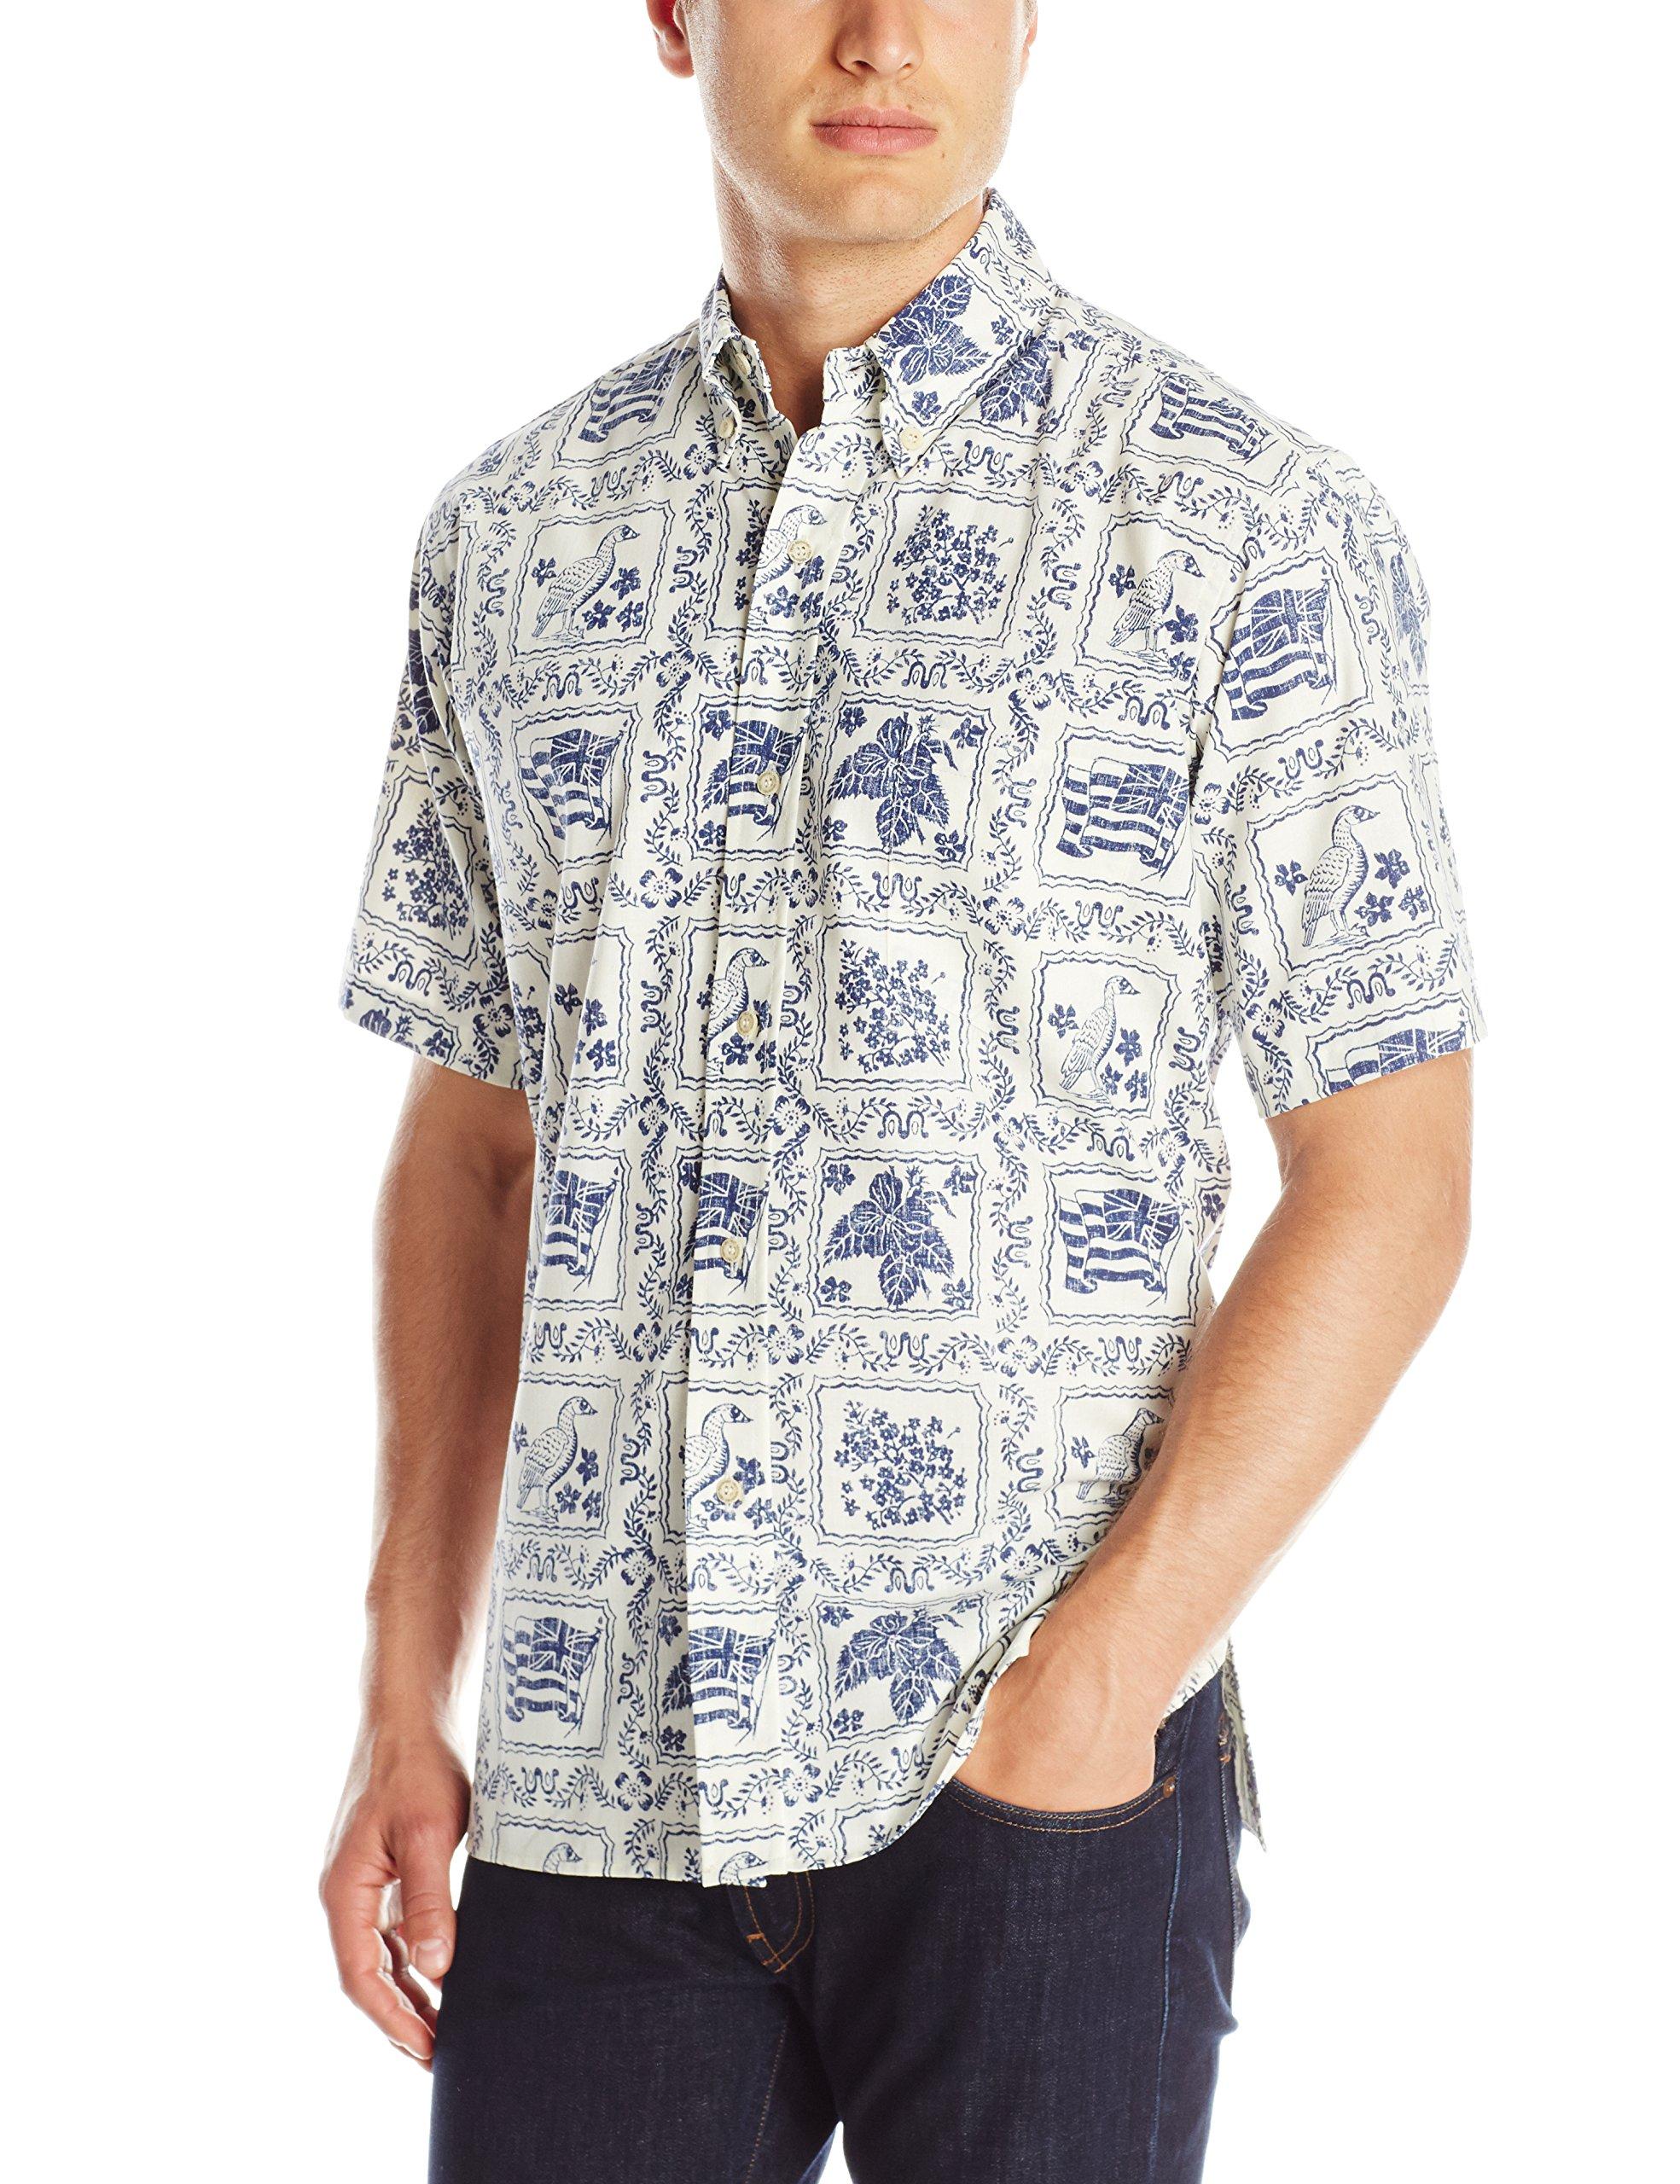 Reyn Spooner Men's Lahaina Sailor Shirt, Natural, Small by Reyn Spooner (Image #1)